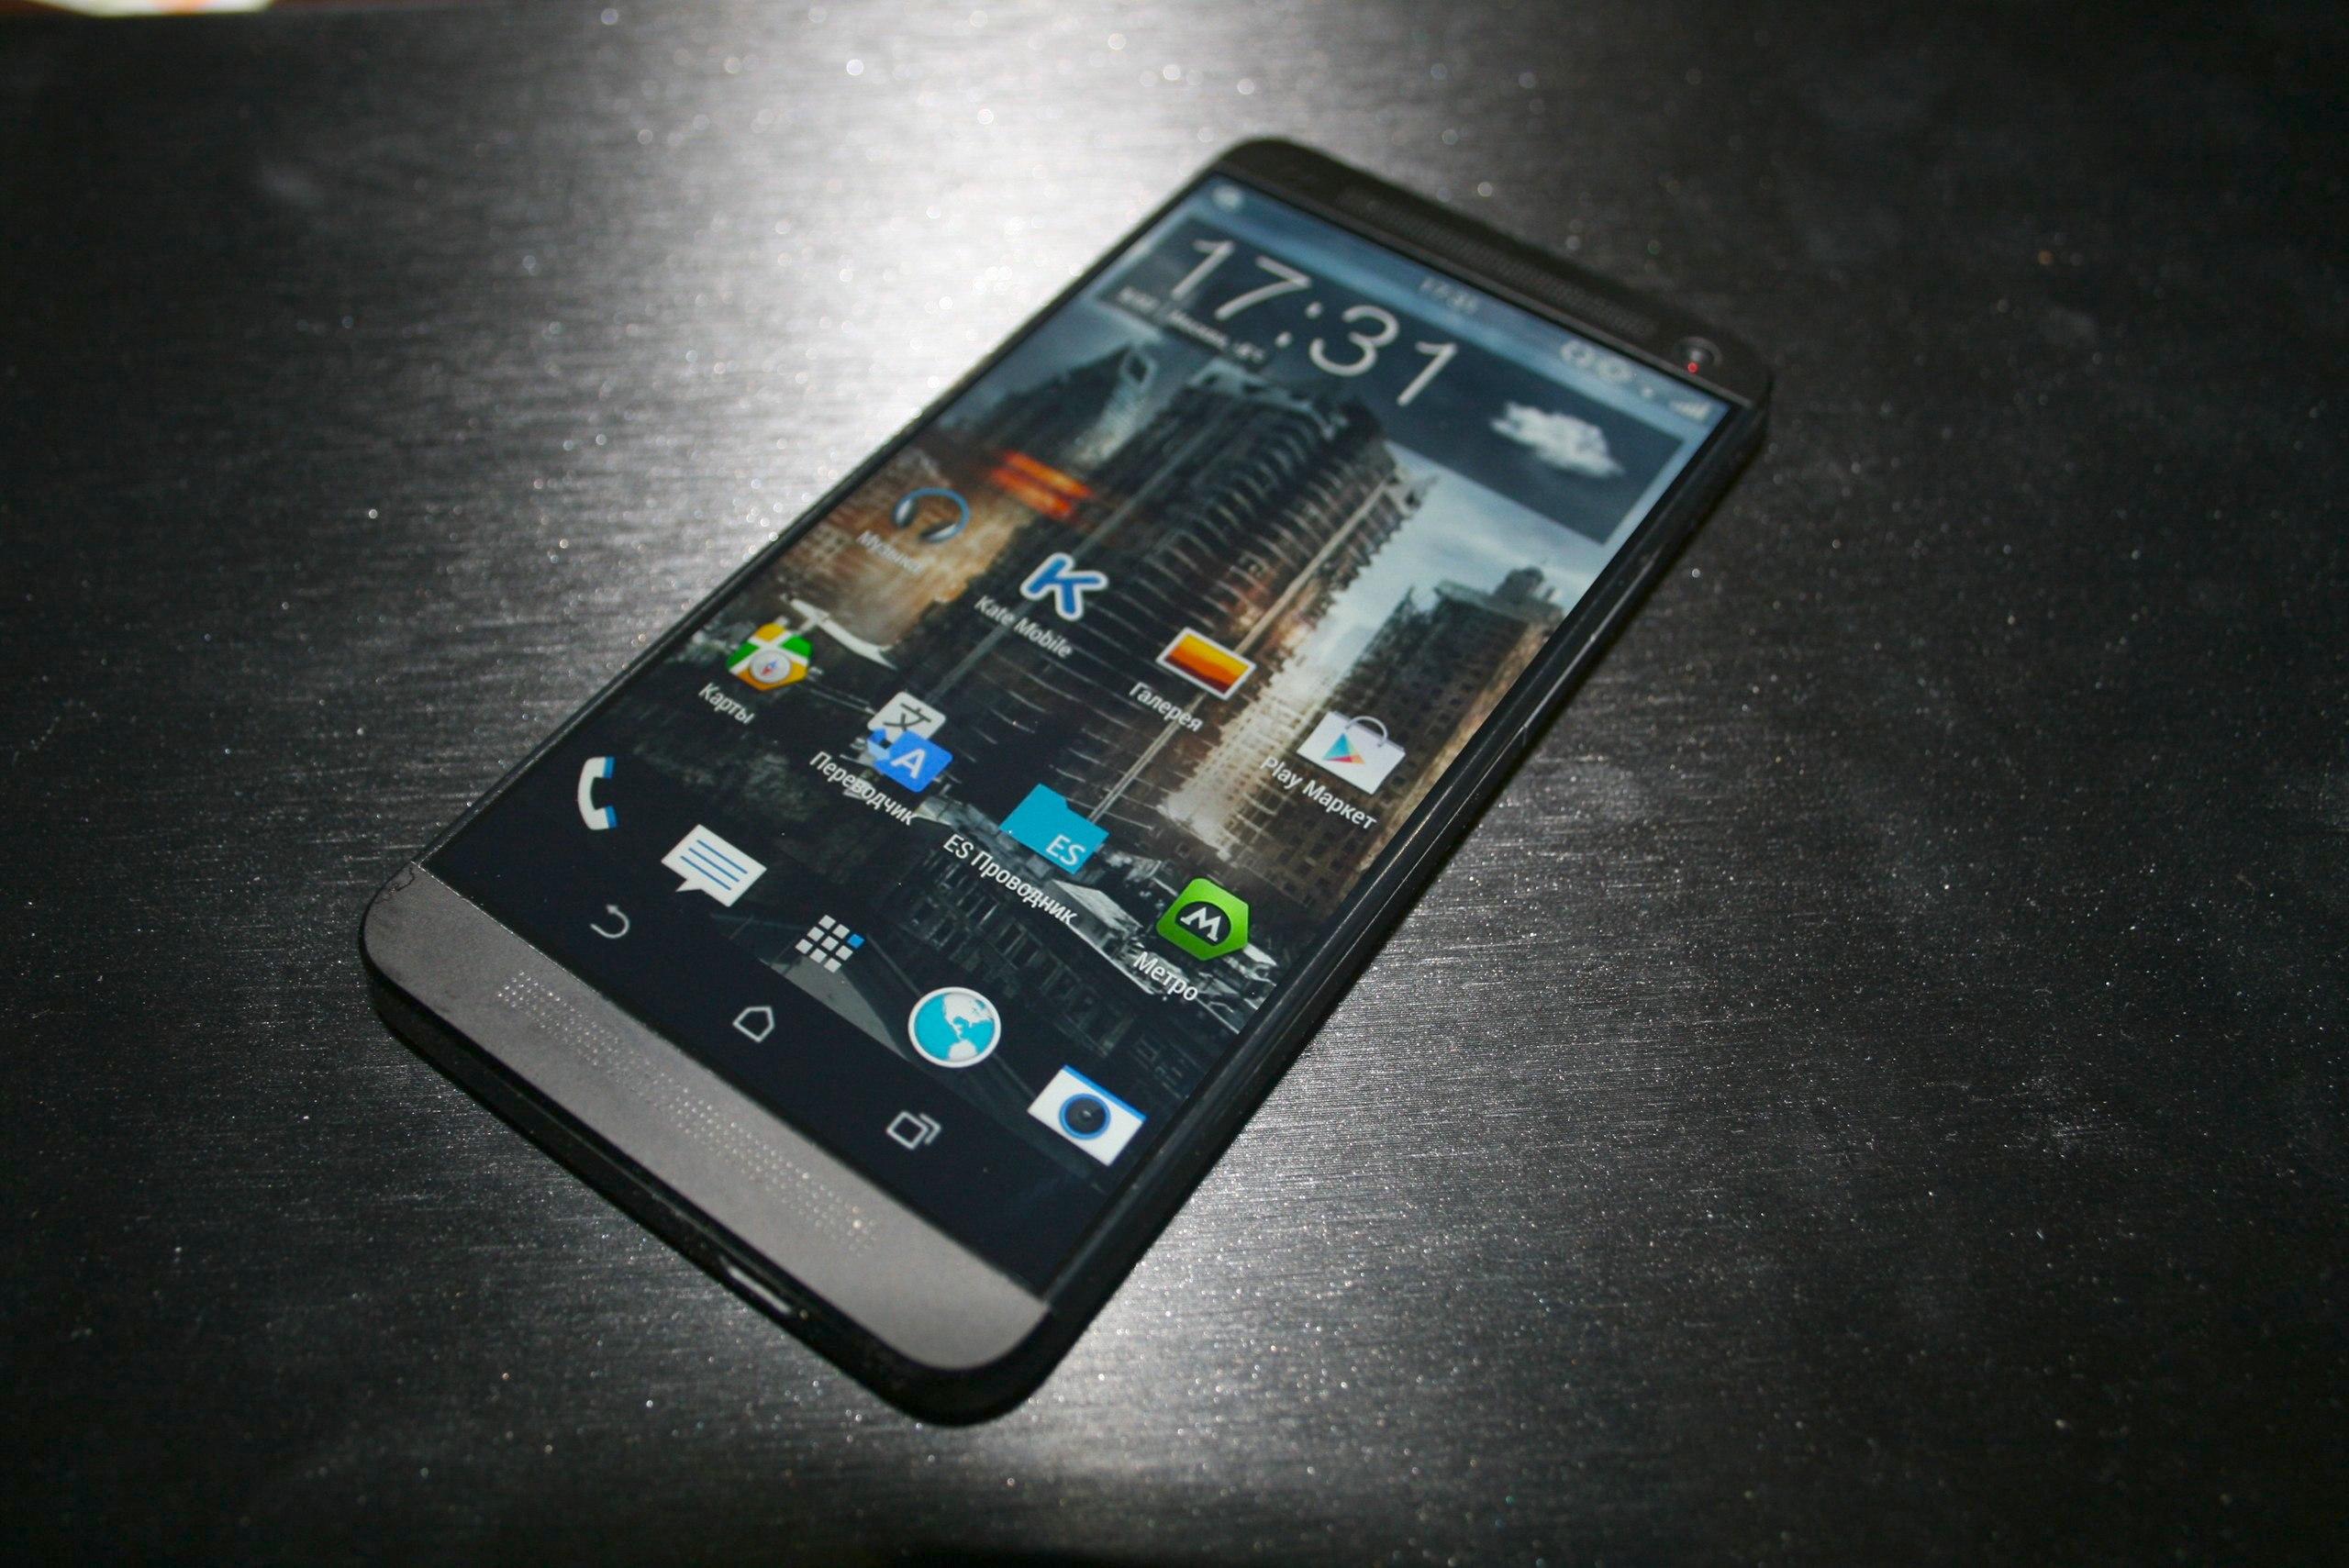 HTC Butterfly 2 با مشخصات M8 وارد بازار خواهد شد!